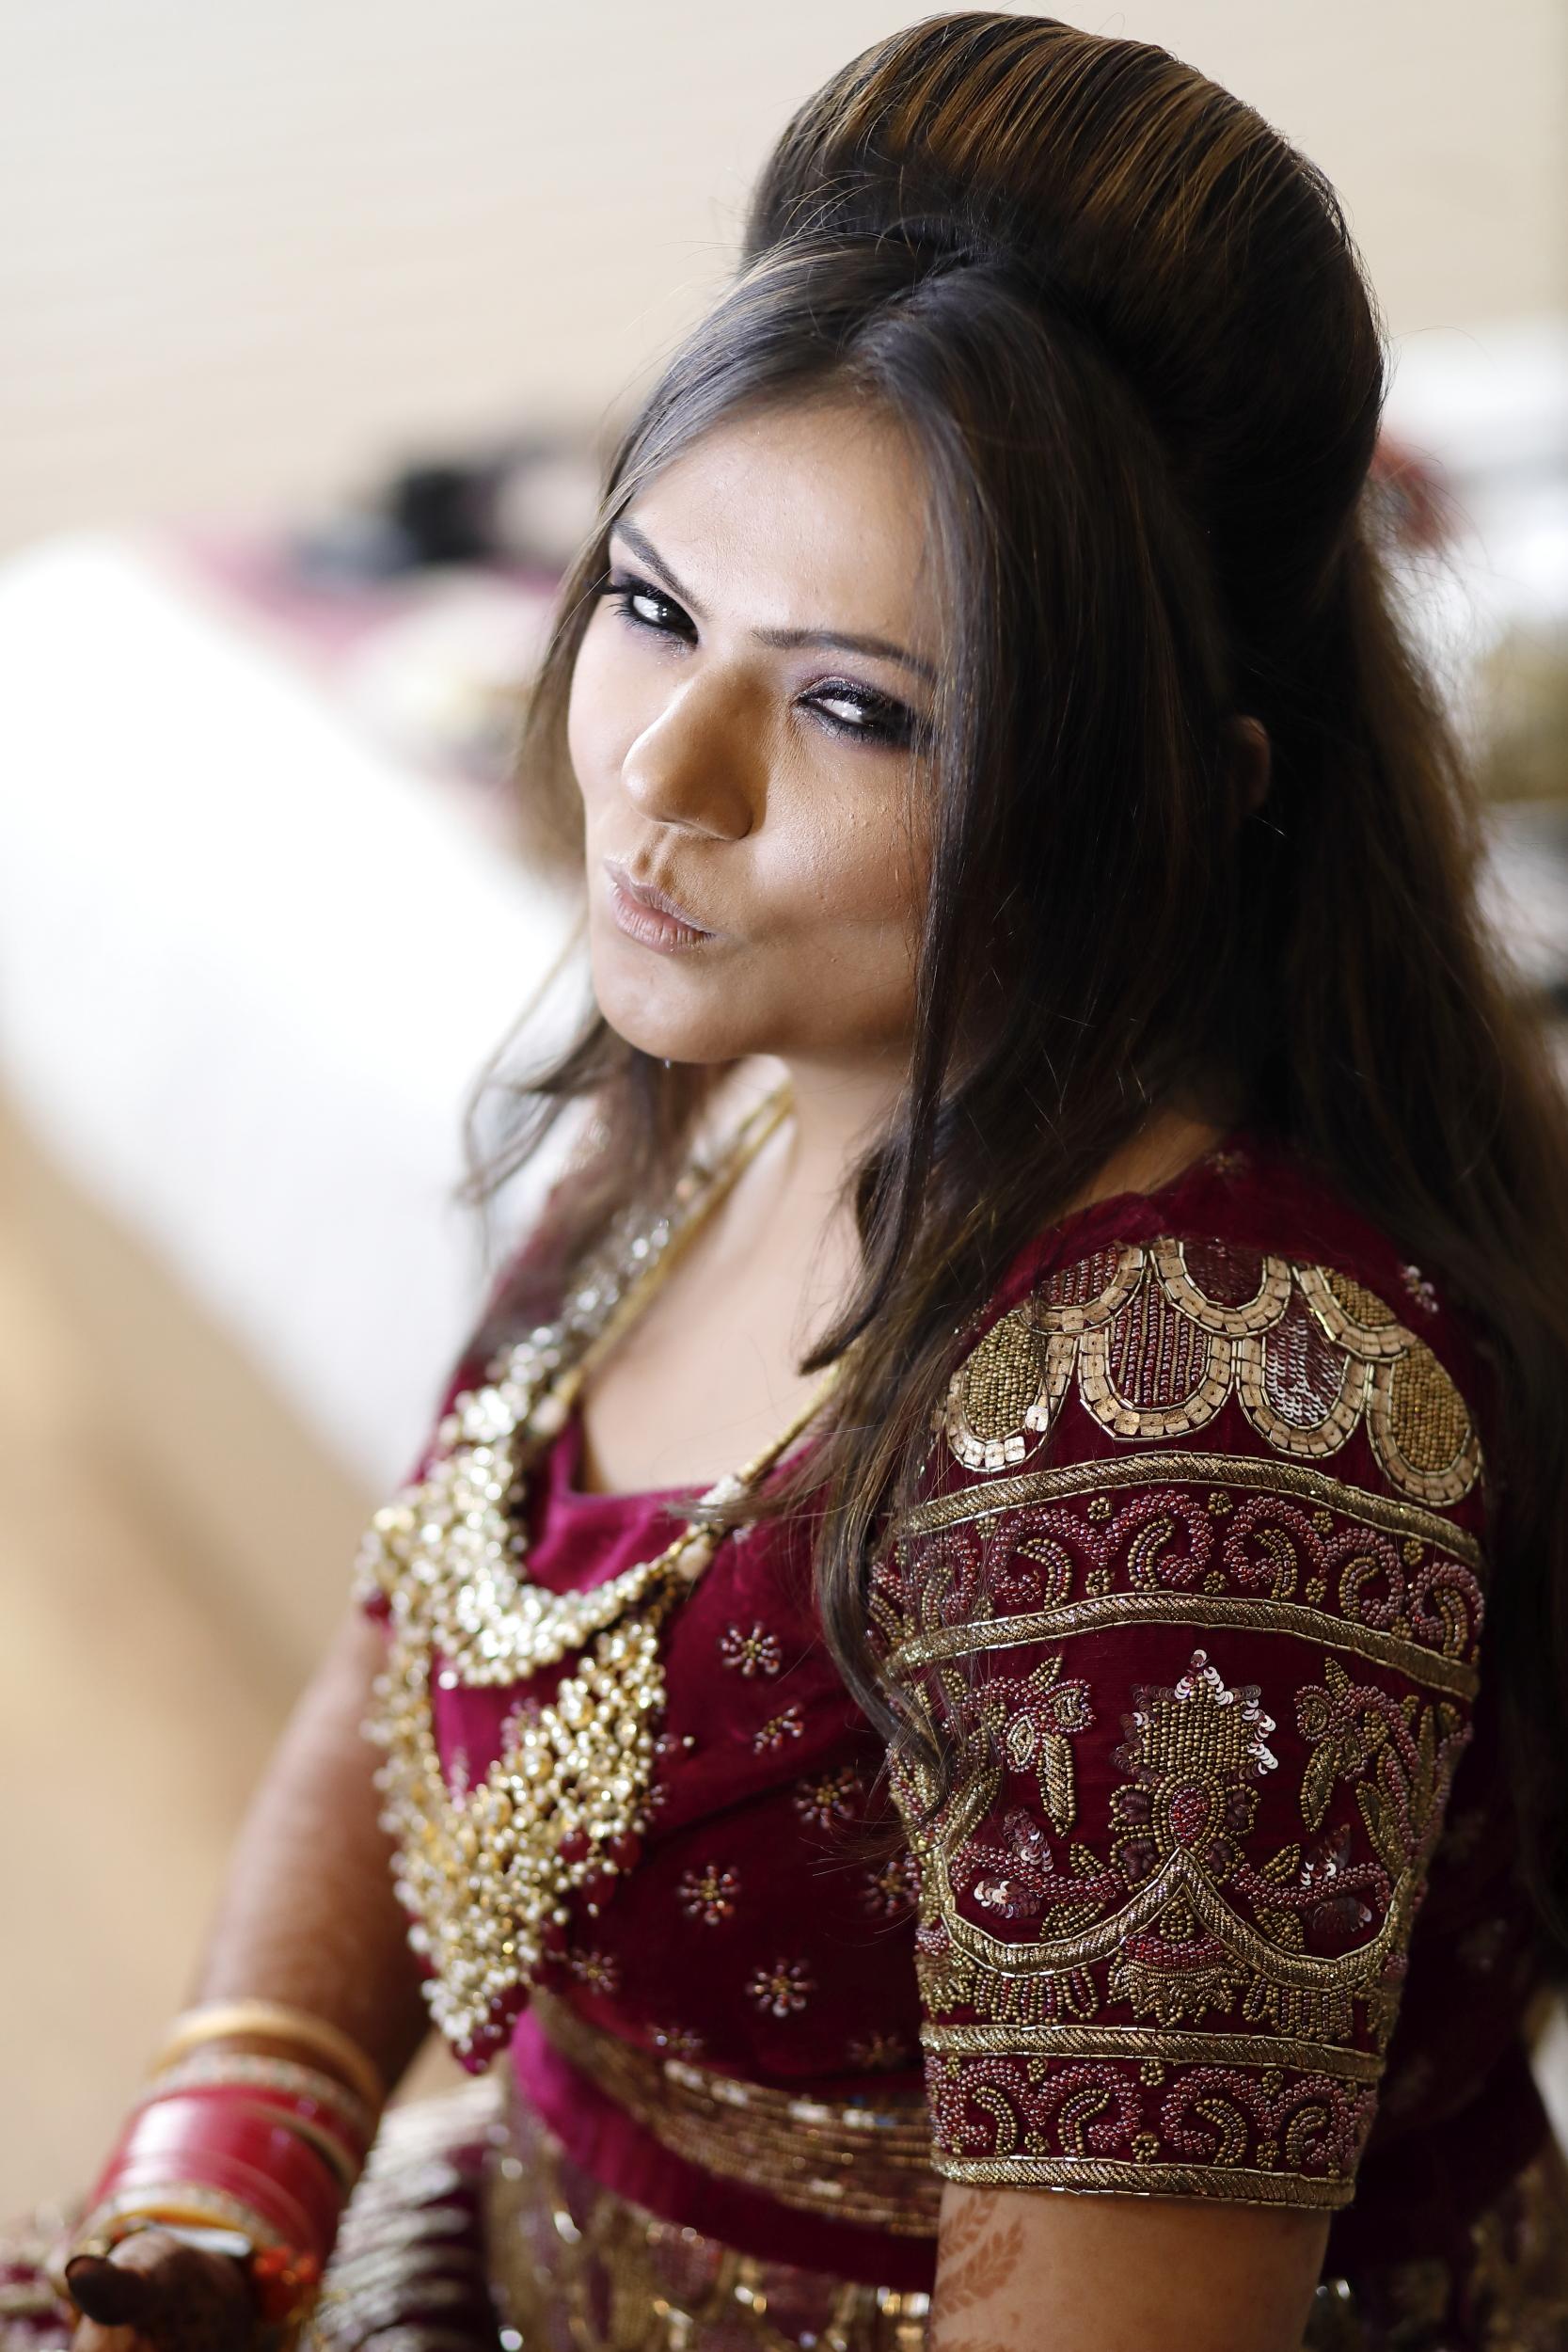 Candid wedding photographersC69A0513 Delhi